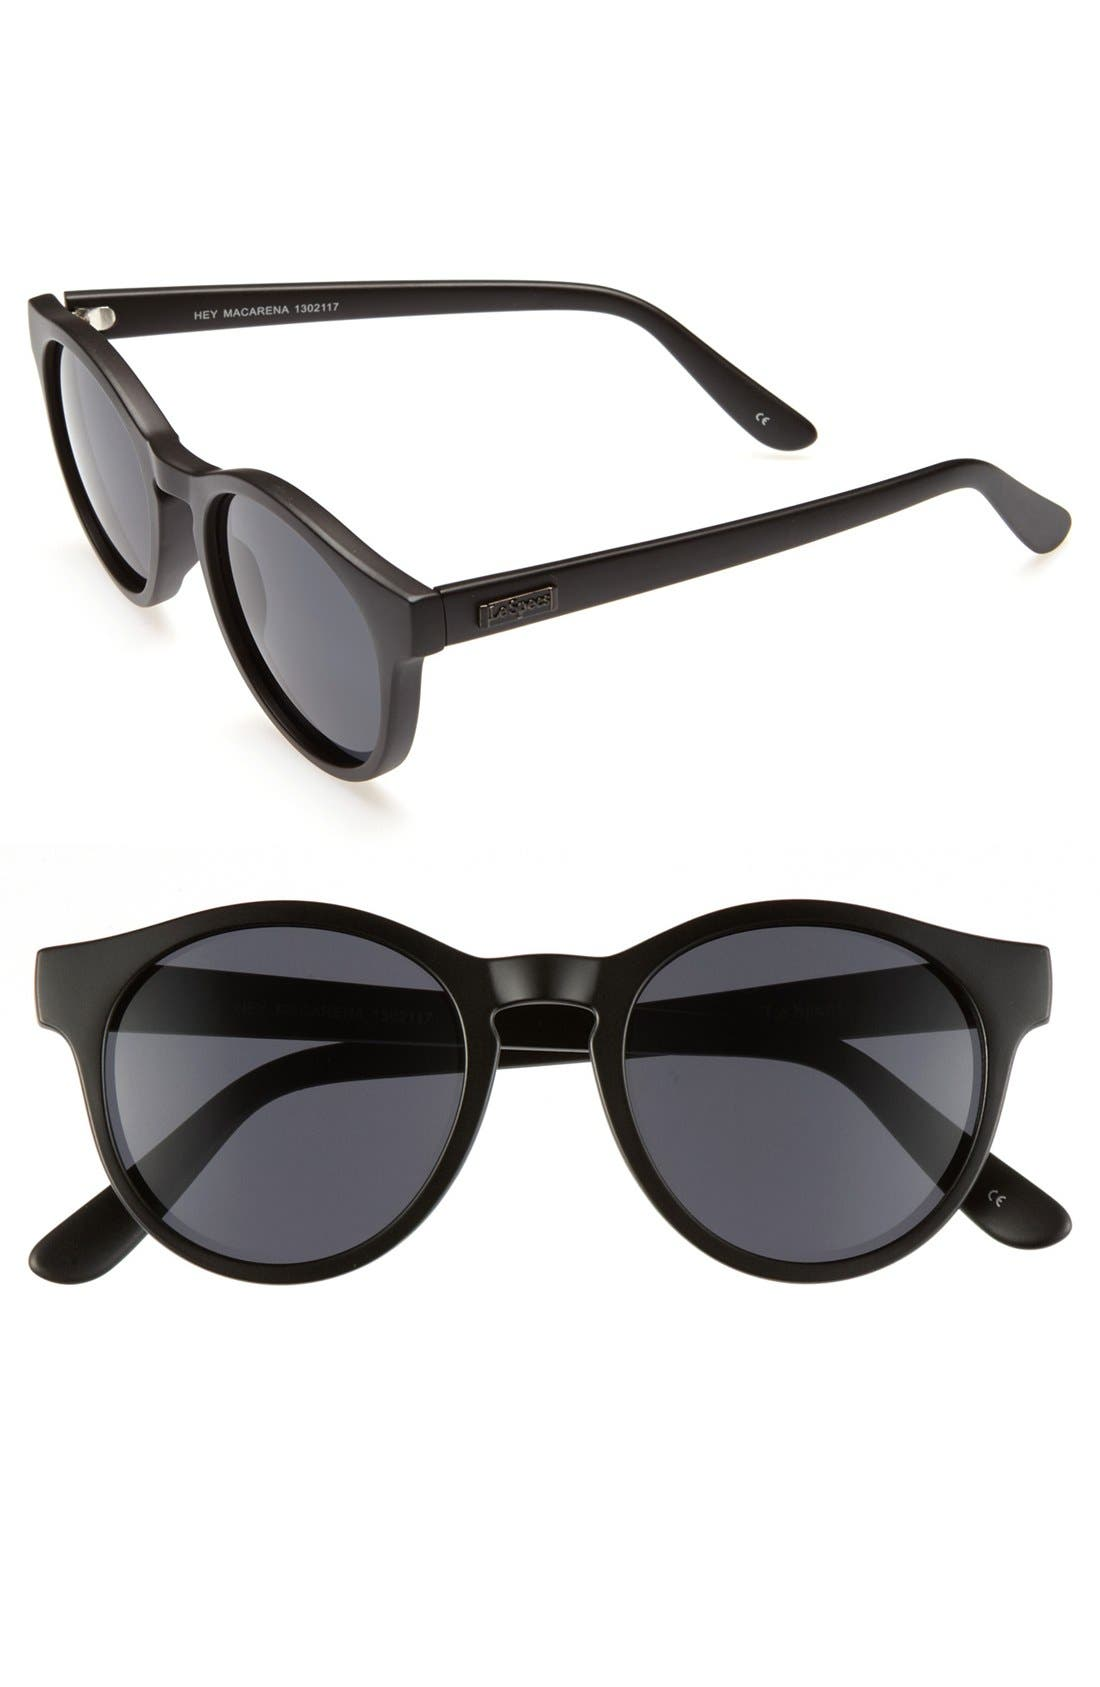 'Hey Macarena' Sunglasses, Main, color, 001